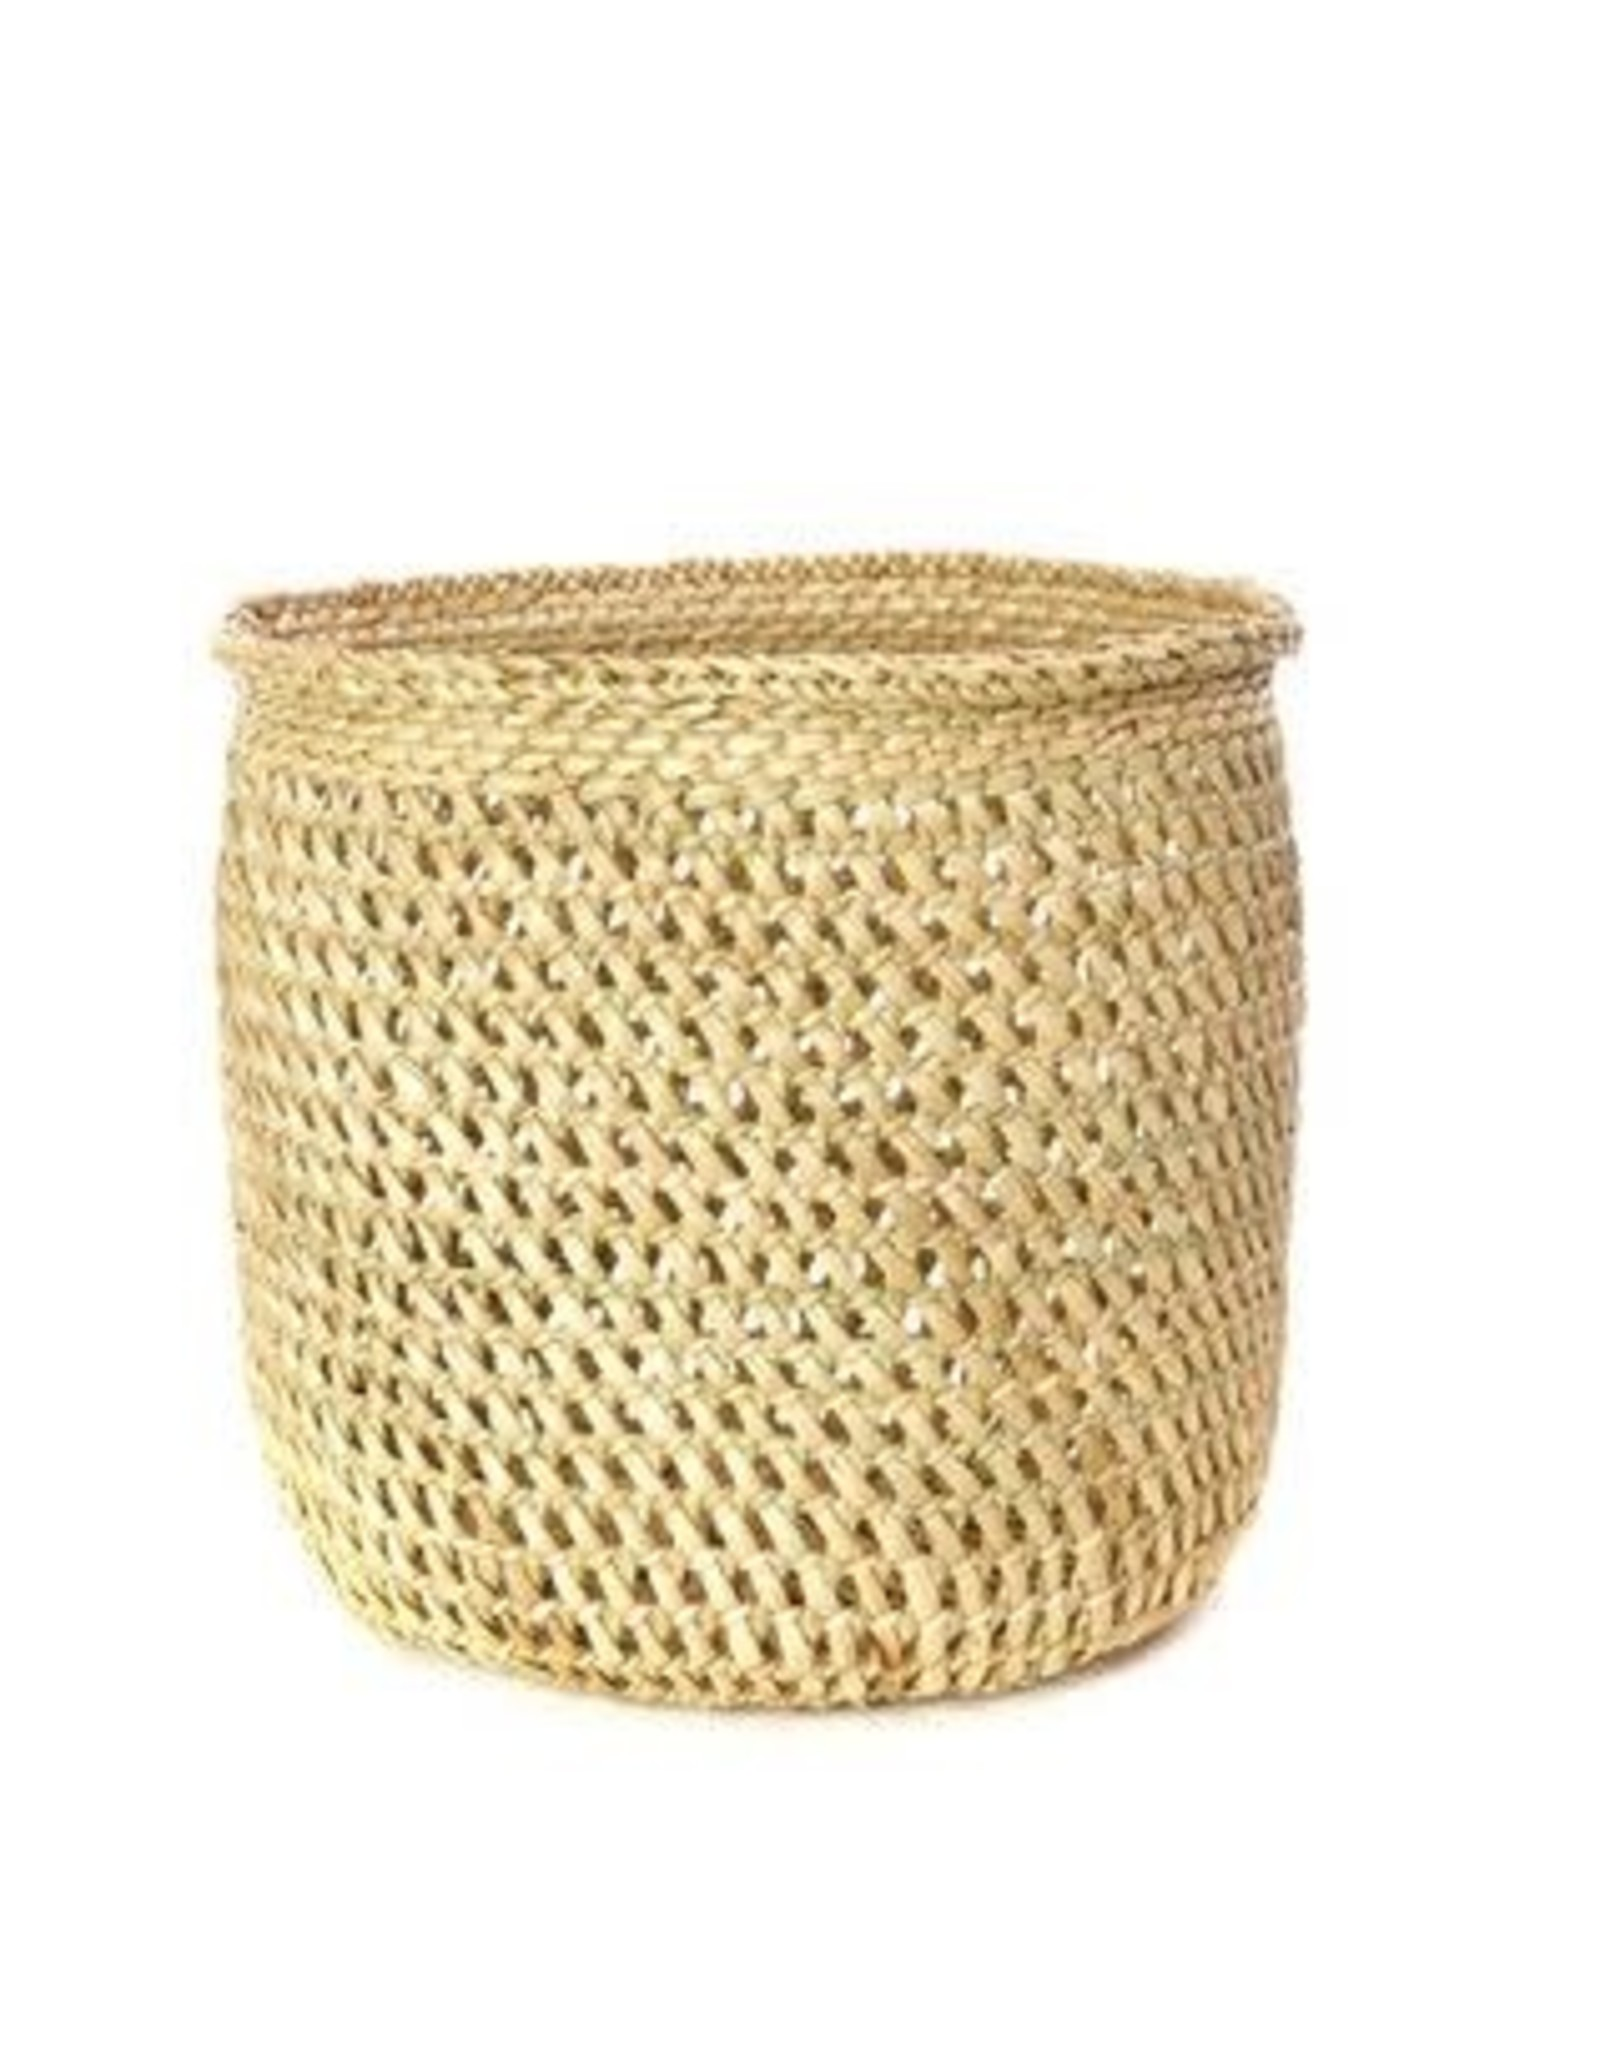 Iringa Basket - Medium